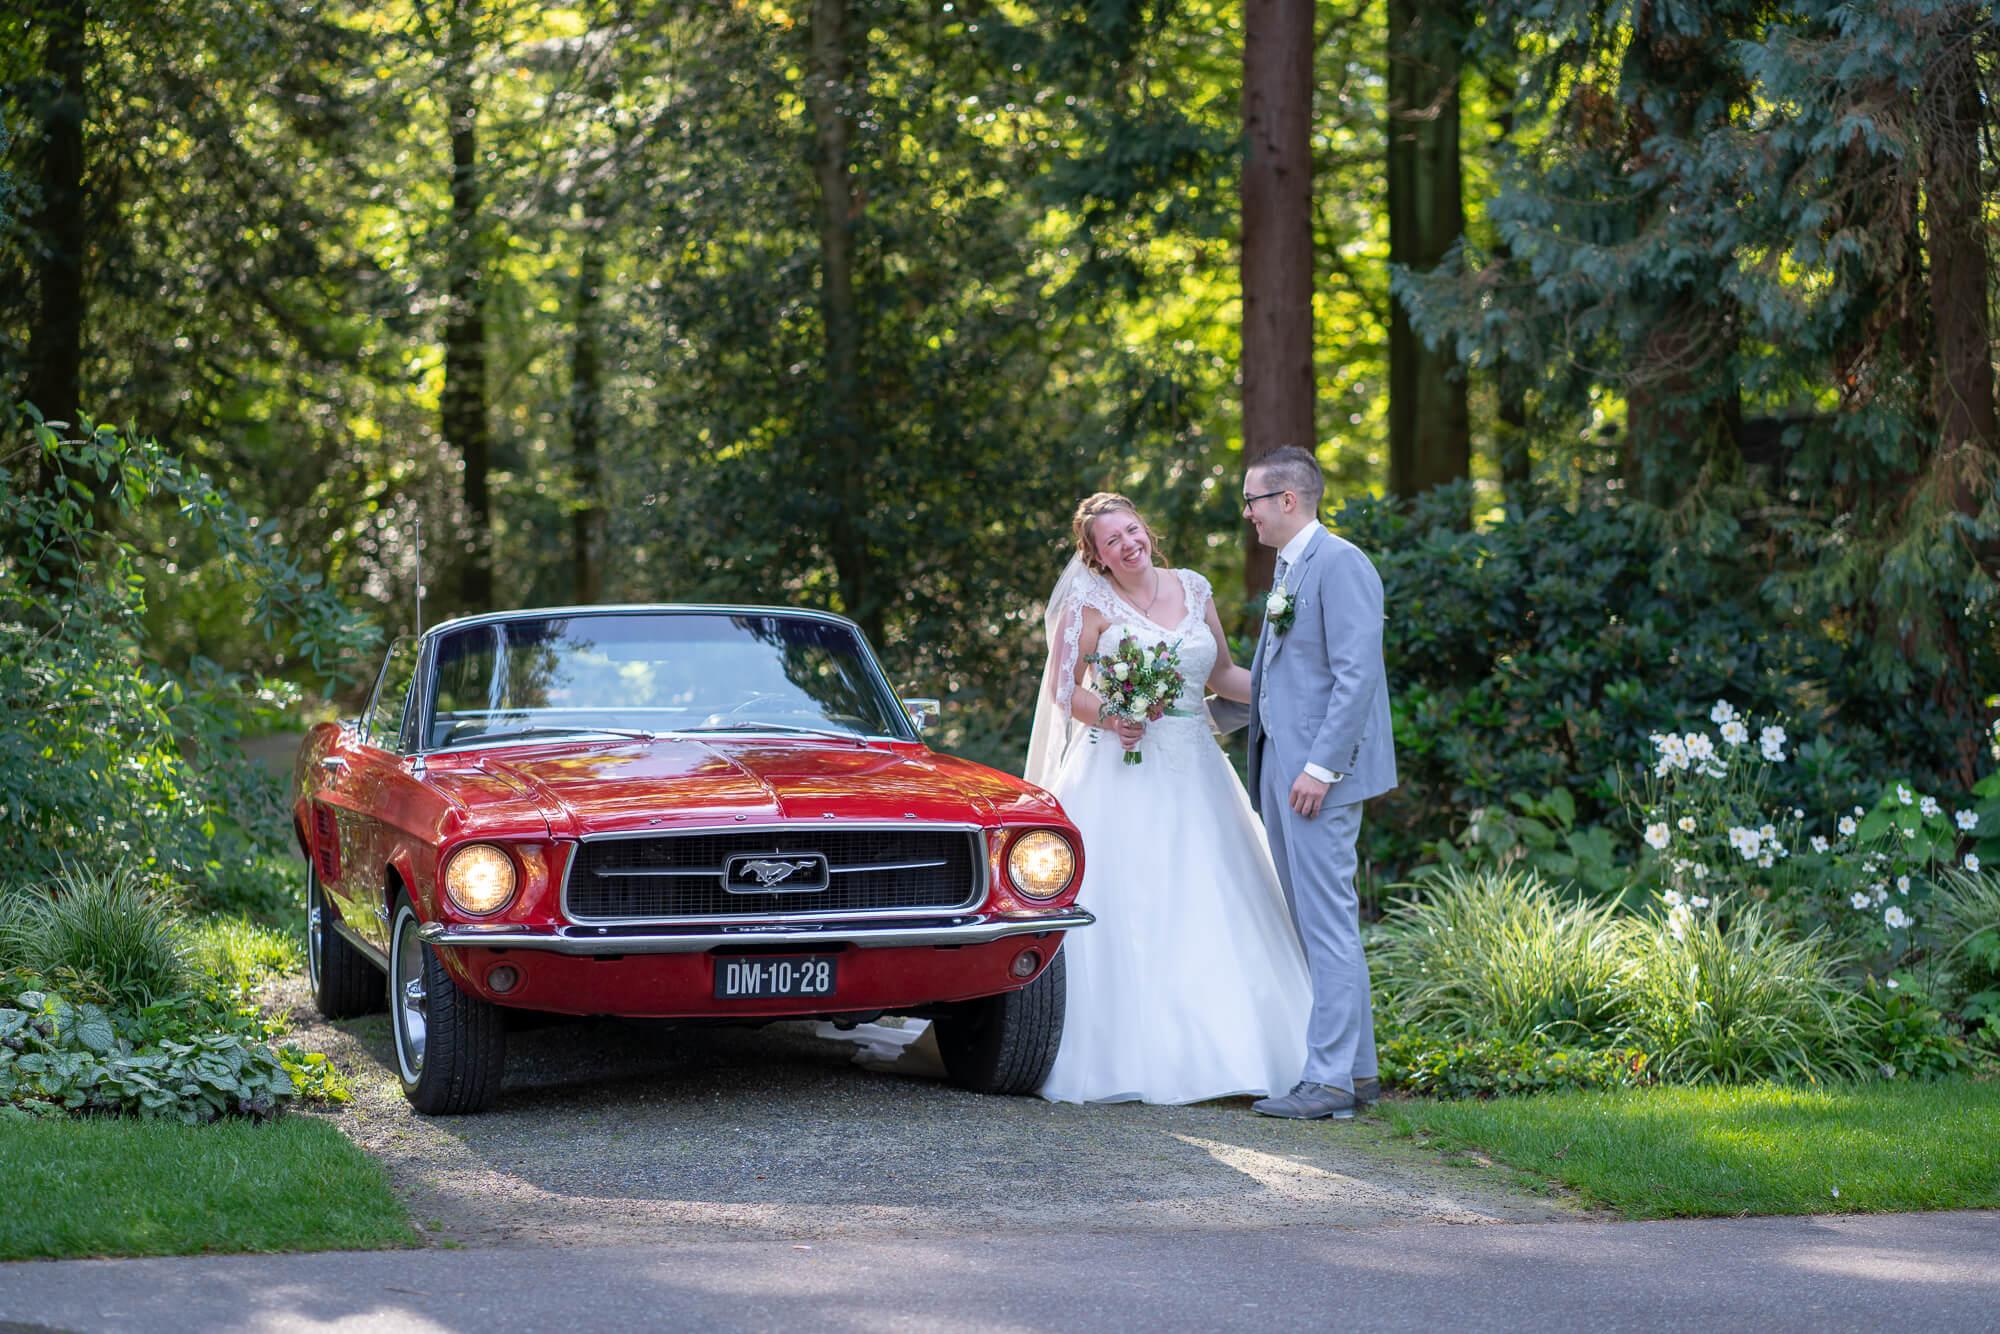 photoshop bewerking vliegend bruidspaar